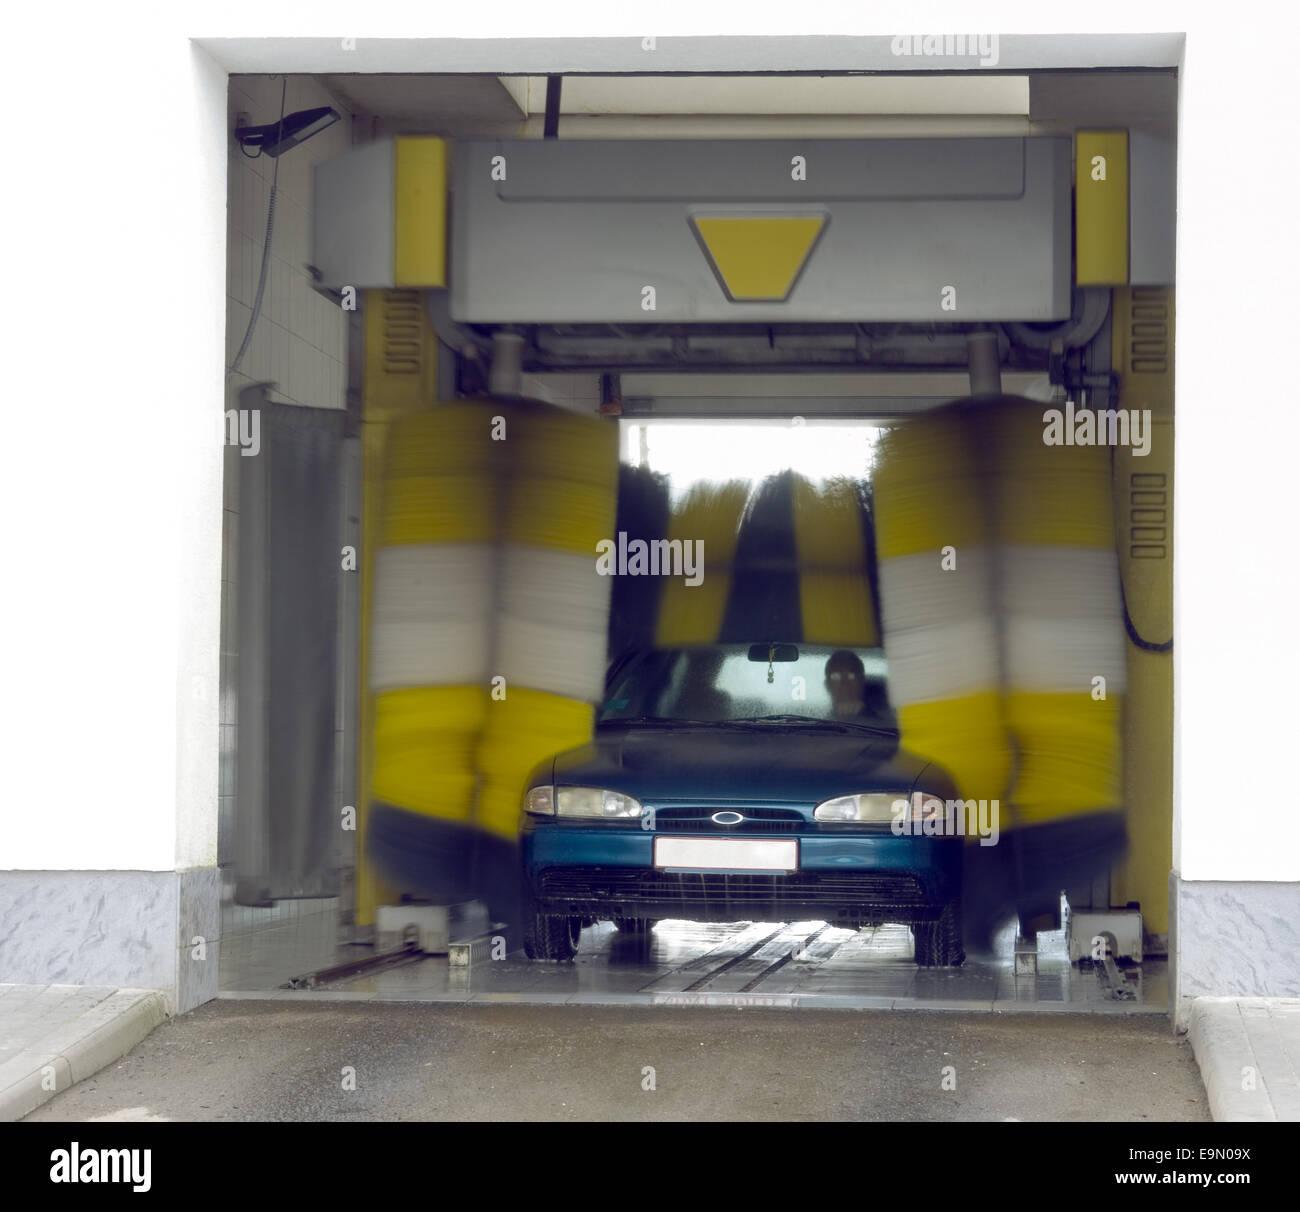 Automatic car wash - Stock Image